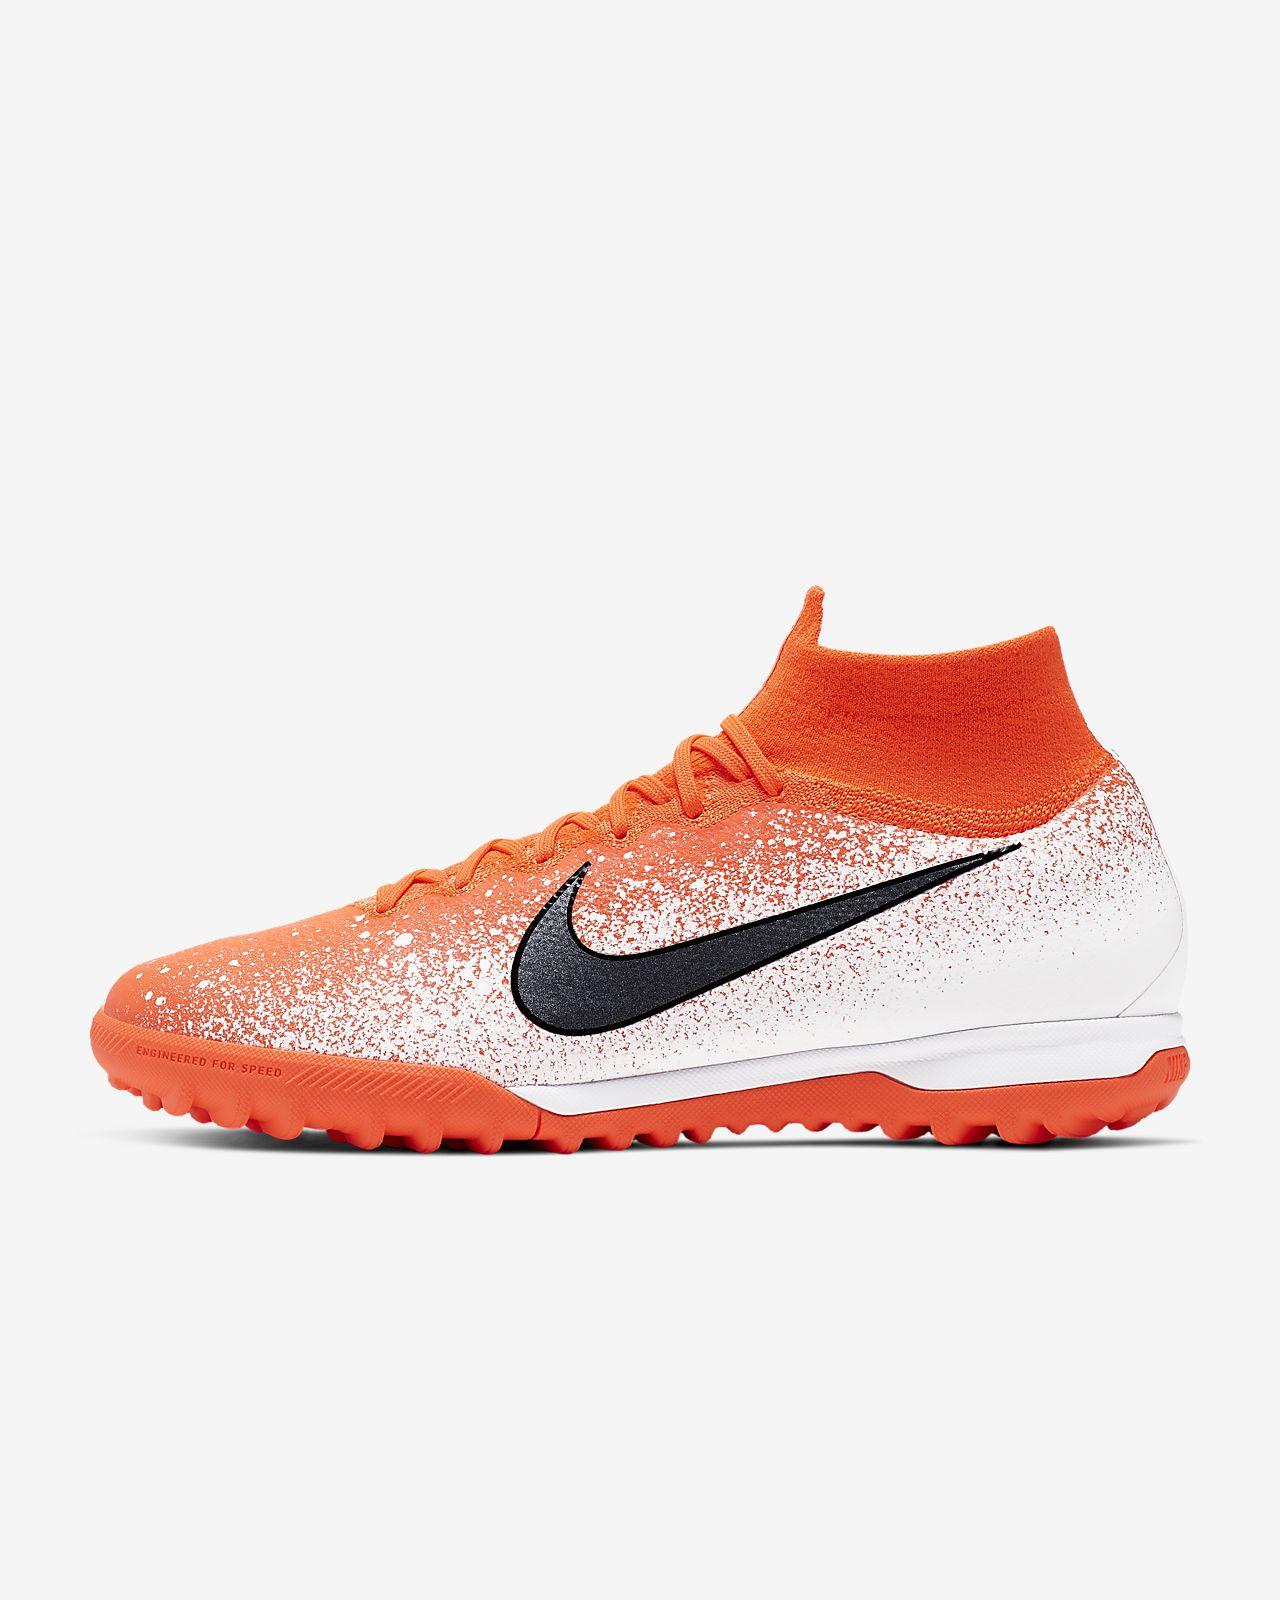 Chaussure de football à crampons pour surface synthétique Nike SuperflyX 6 Elite TF